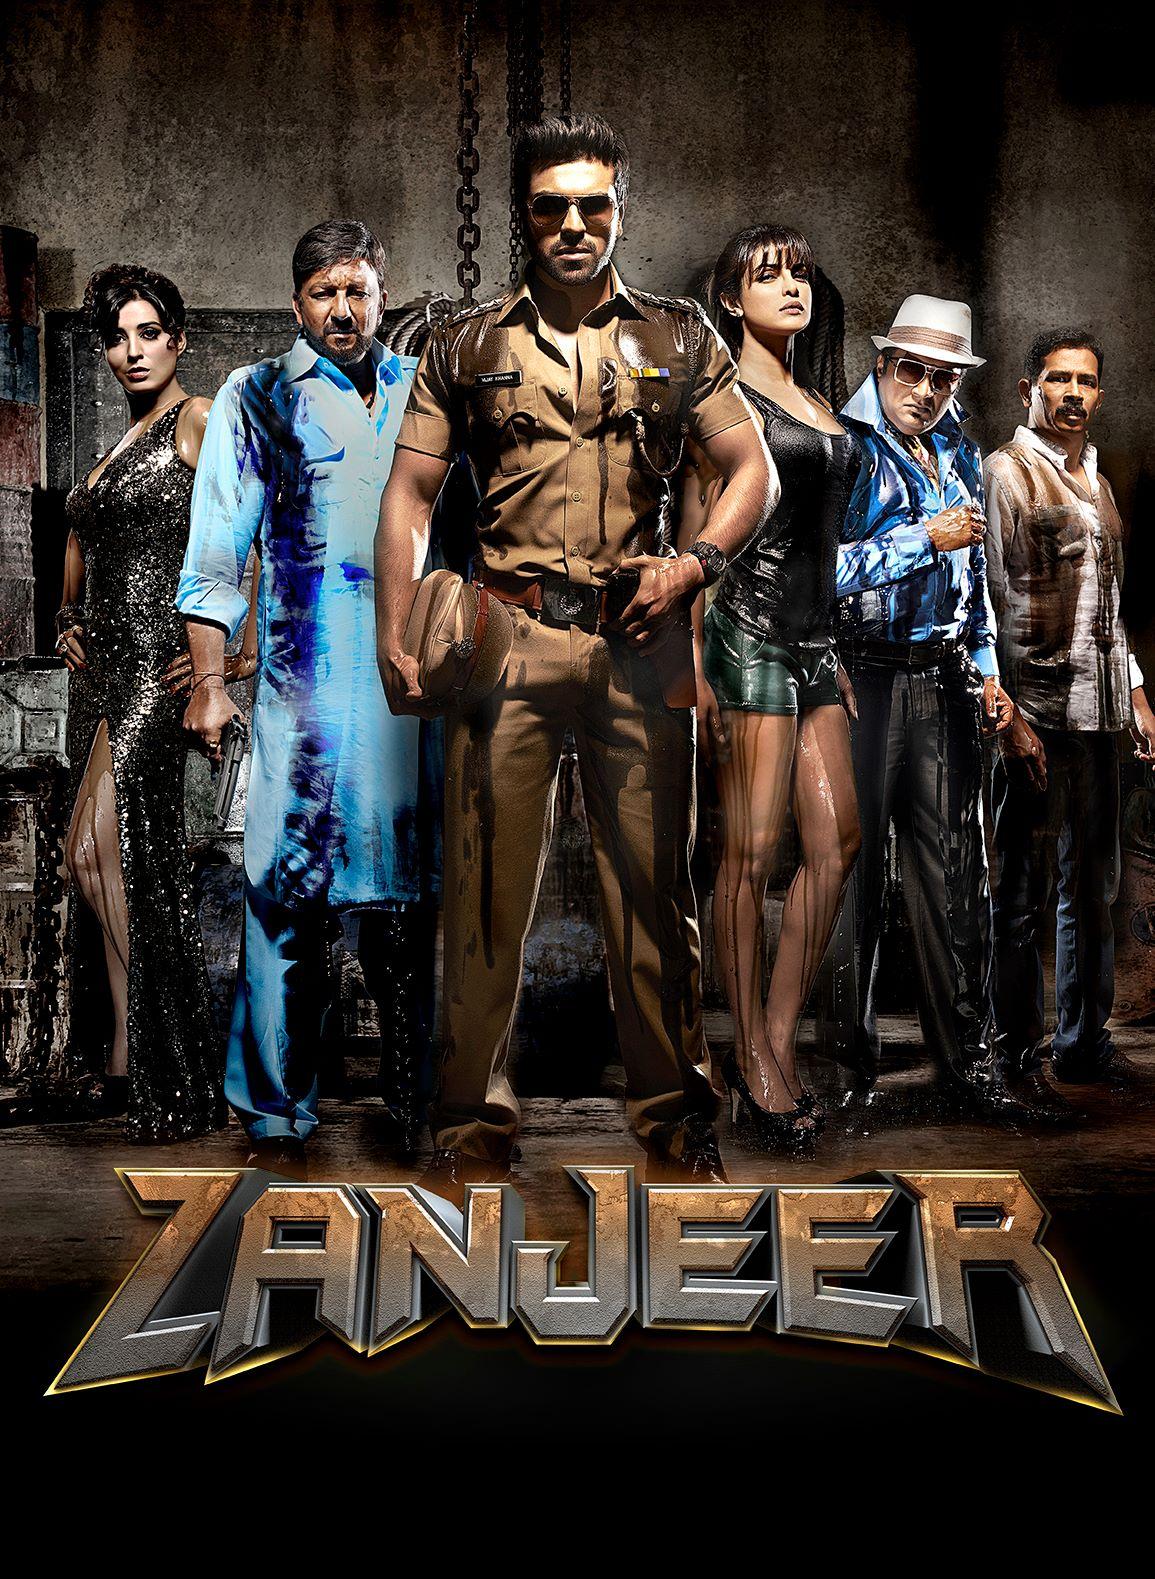 Zanjeer - Movie Poster #3 (Original)